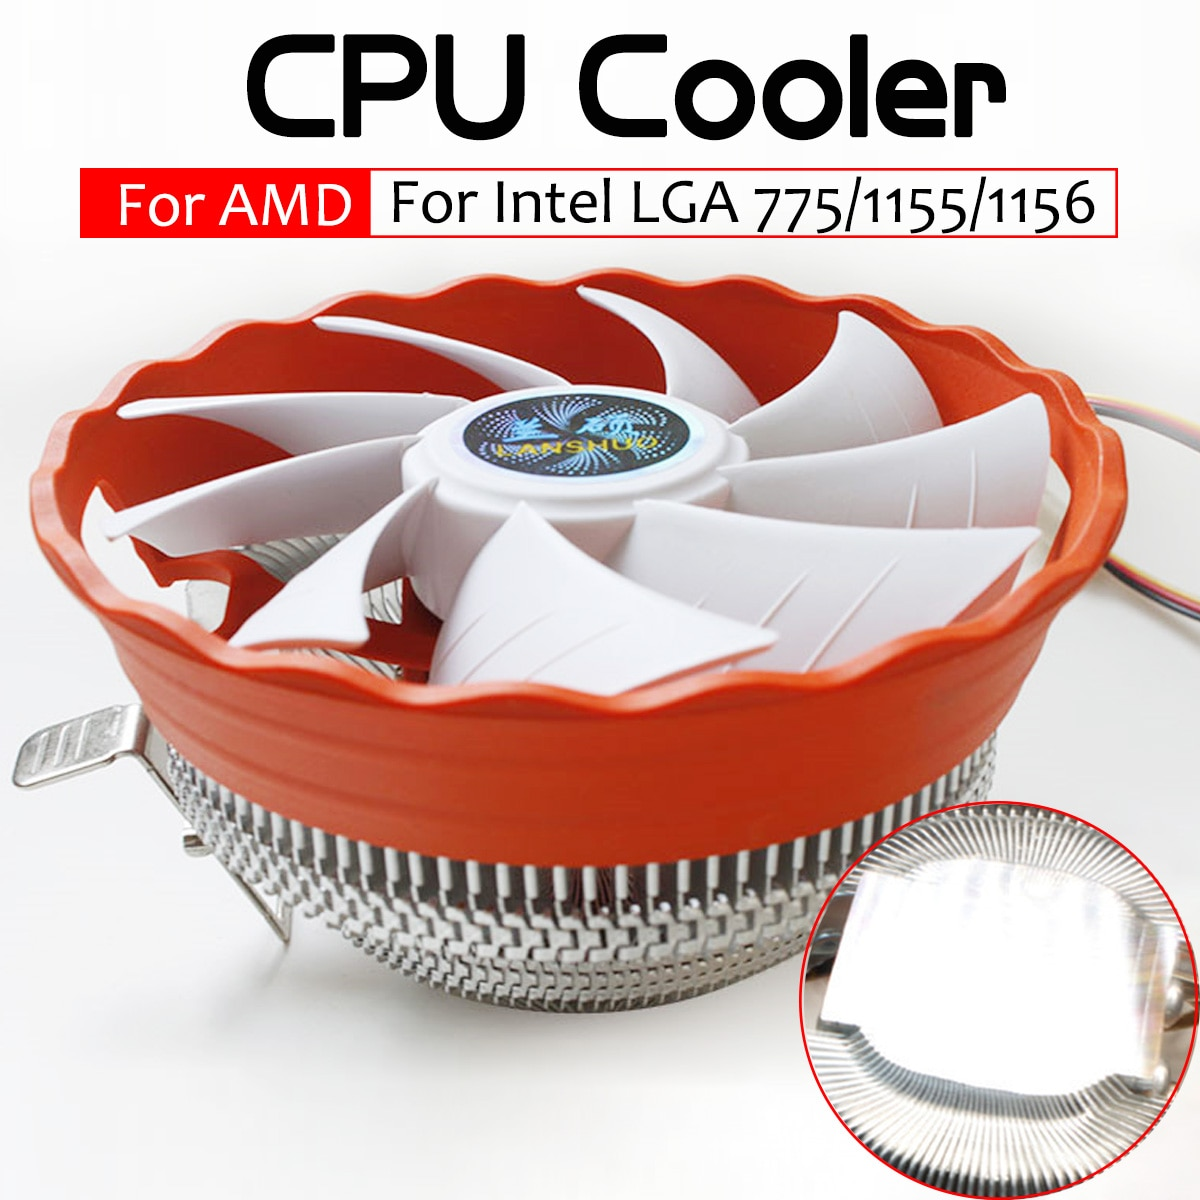 CPU Kühler Fan 12V Hydraulische Lager Kühlkörper RGB Fan Computer PC Gehäuse Kühlung Kühler für Intel LGA 775 1150 1155 1156 AMD1150